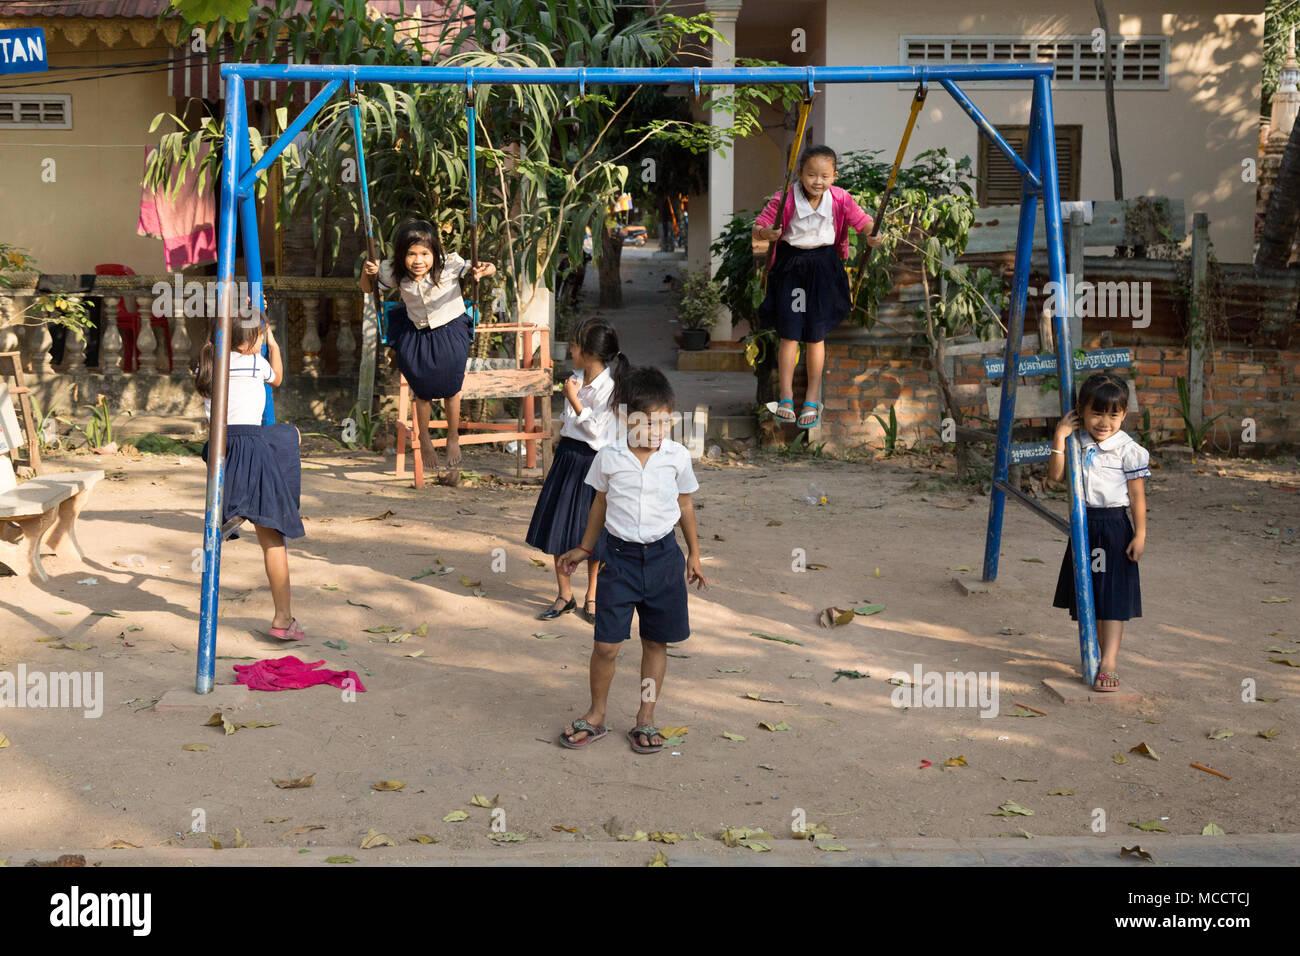 Asian schoolchildren - Cambodian primary school children in school playground, Siem Reap, Cambodia, Asia - Stock Image